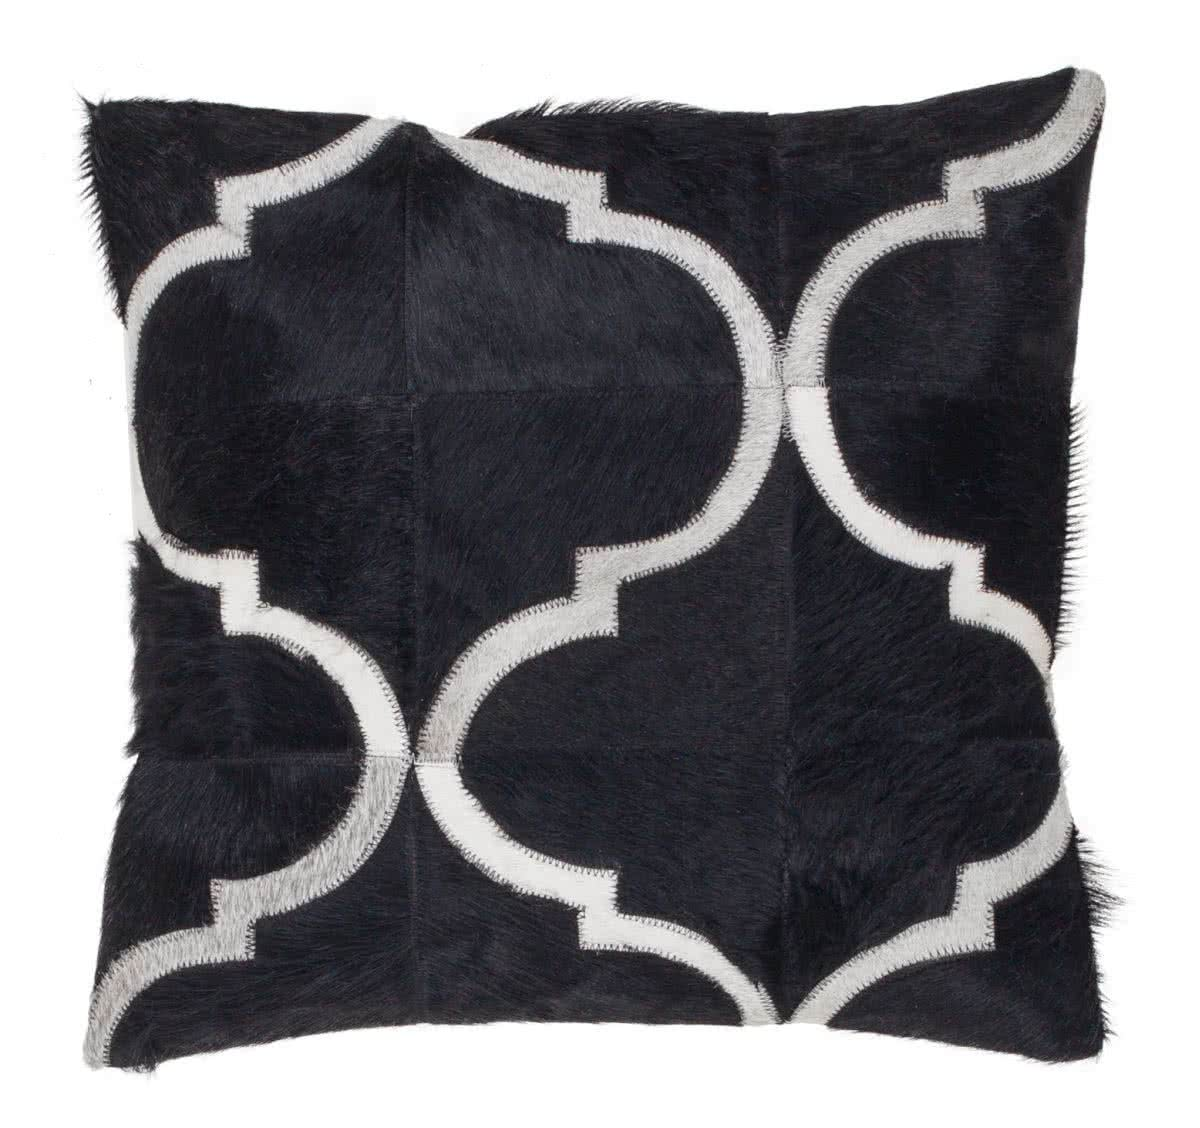 lavish kissen schwarz jetzt g nstig im carpet center. Black Bedroom Furniture Sets. Home Design Ideas